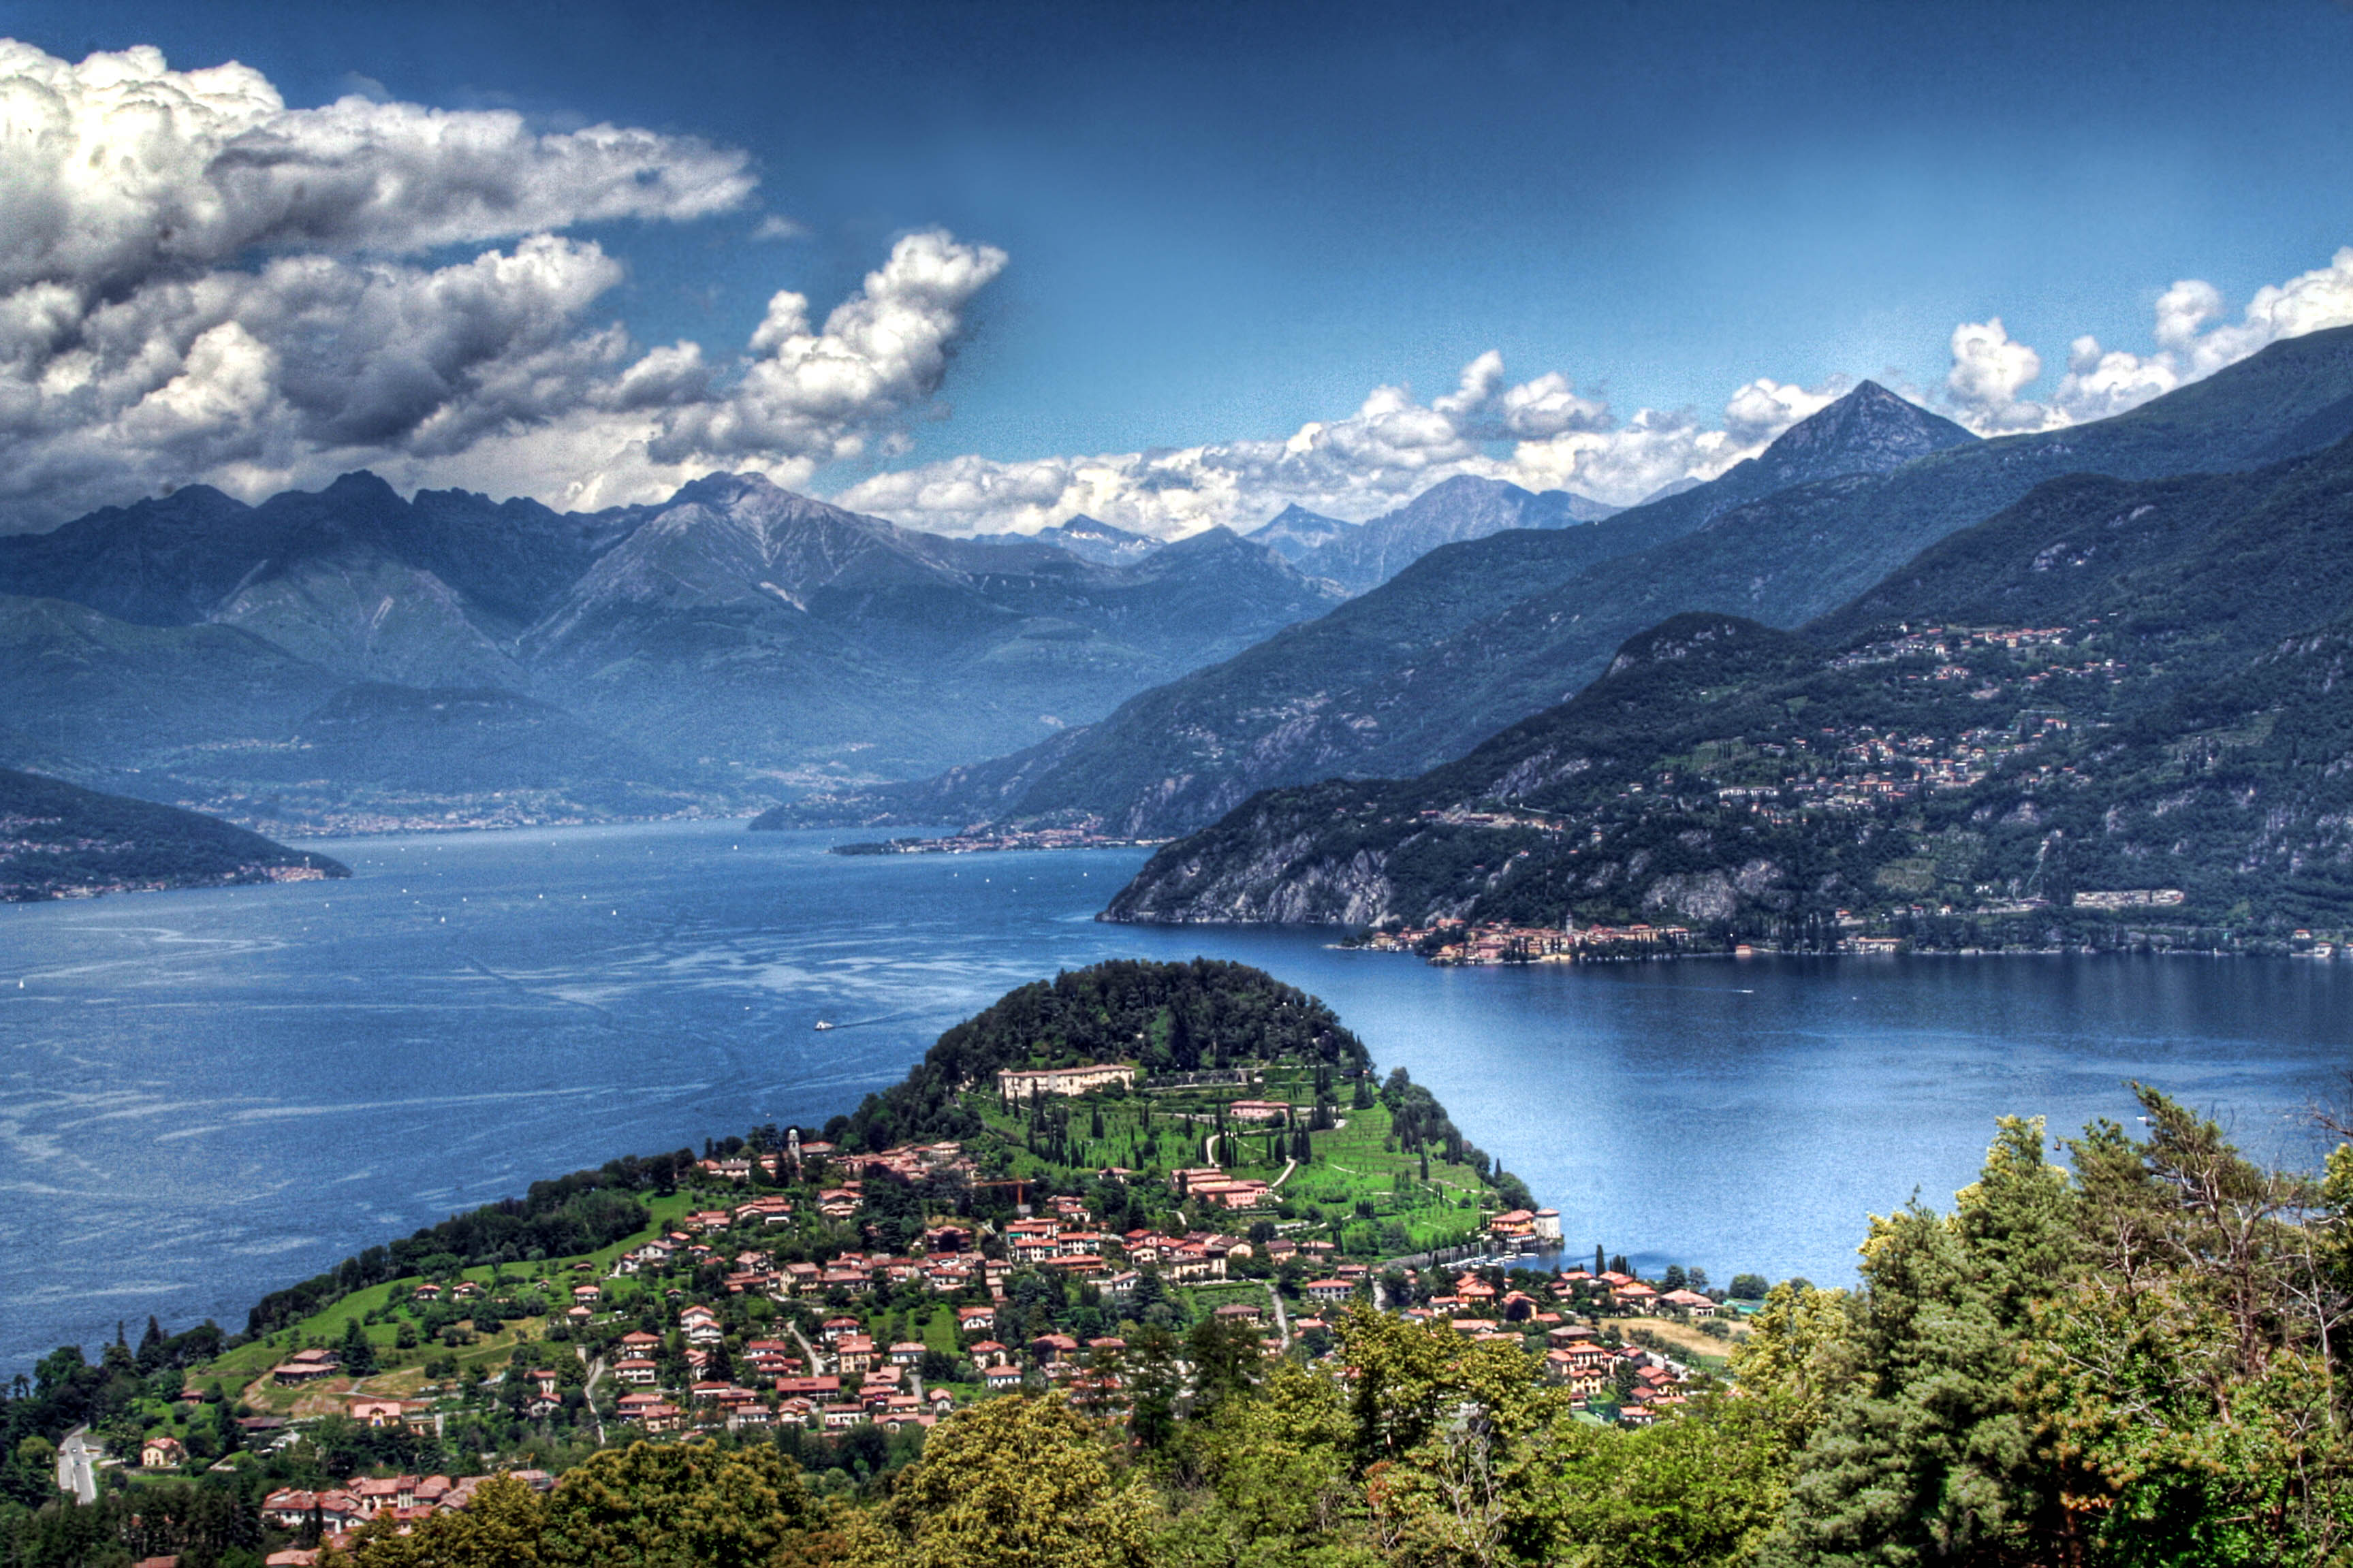 Adembenemend mooi 7 dagen comomeer noord itali nu v a for Disegni casa sul lago